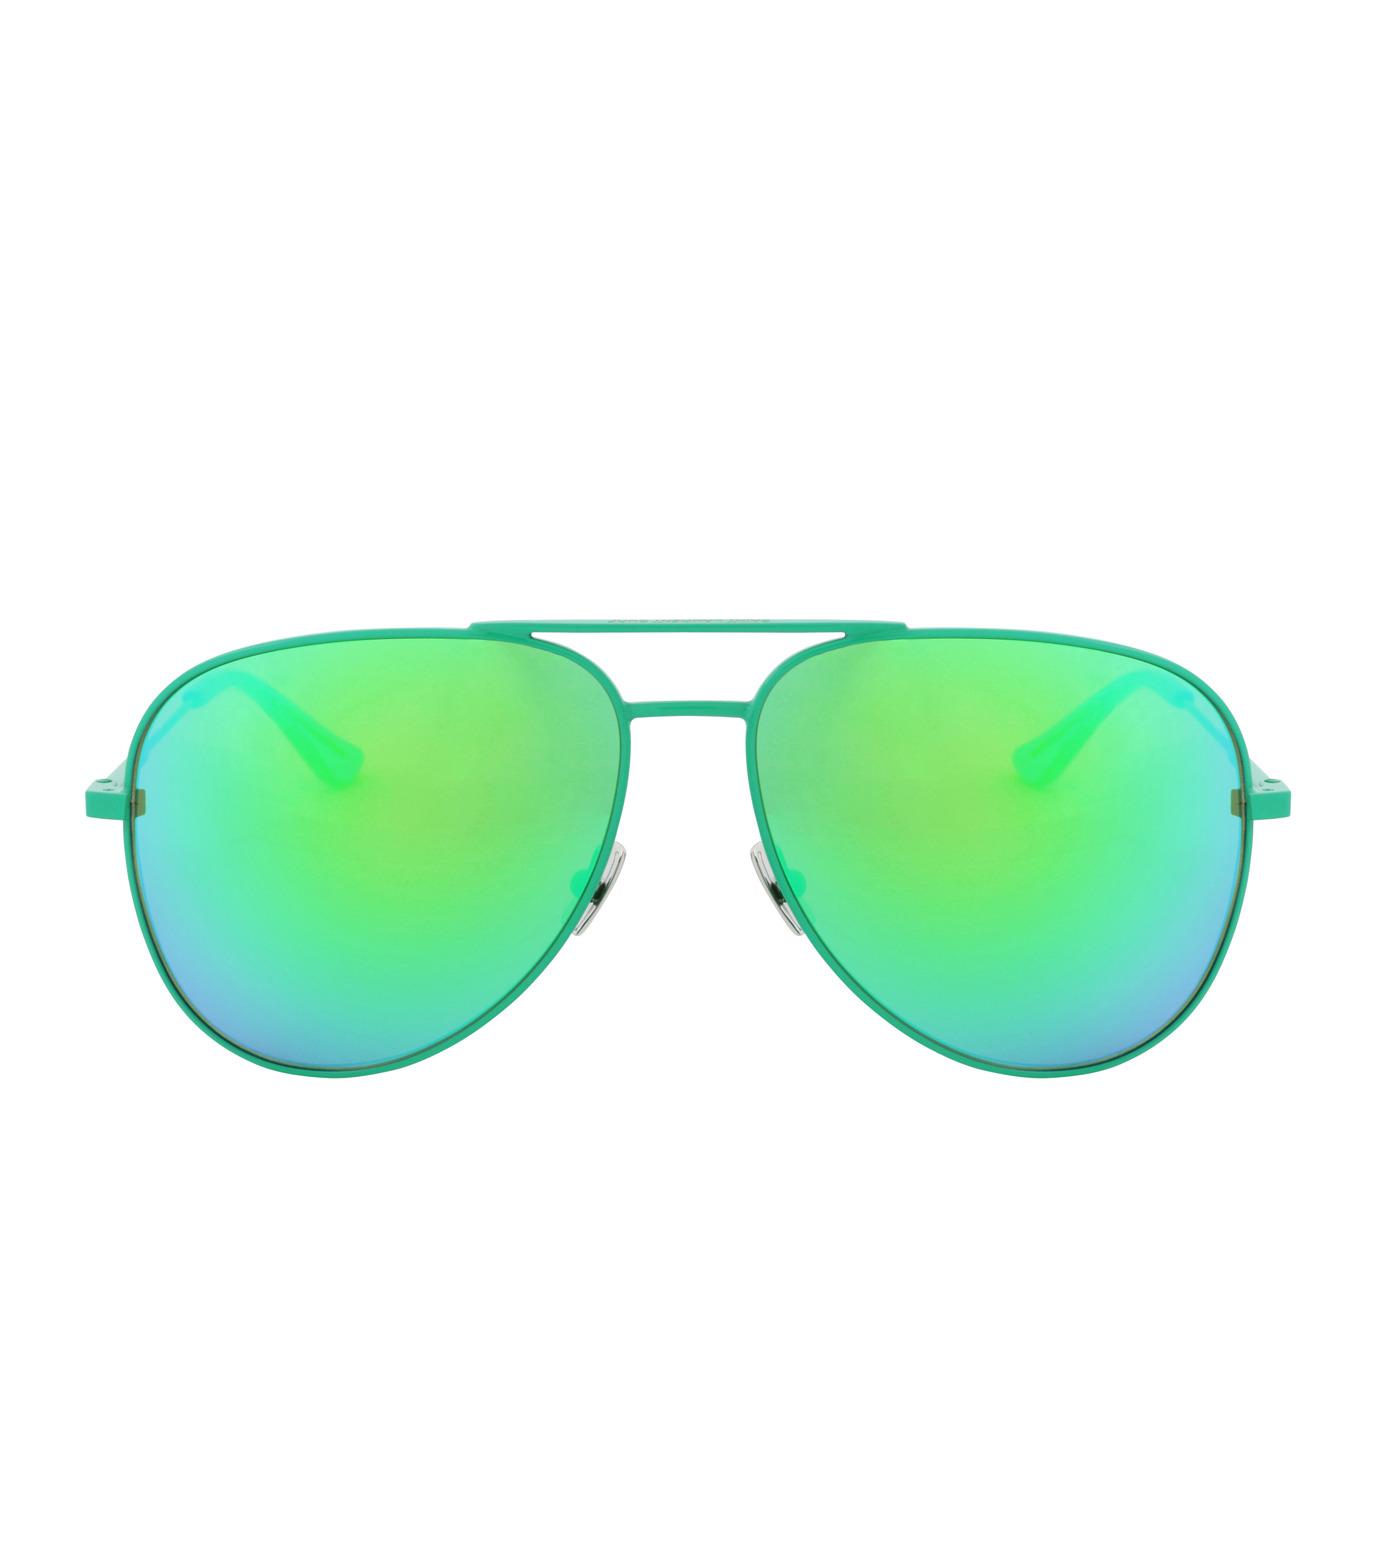 SAINT LAURENT(サンローラン)のTeardrop-GREEN(アイウェア/eyewear)-427758-Y9902-22 拡大詳細画像3